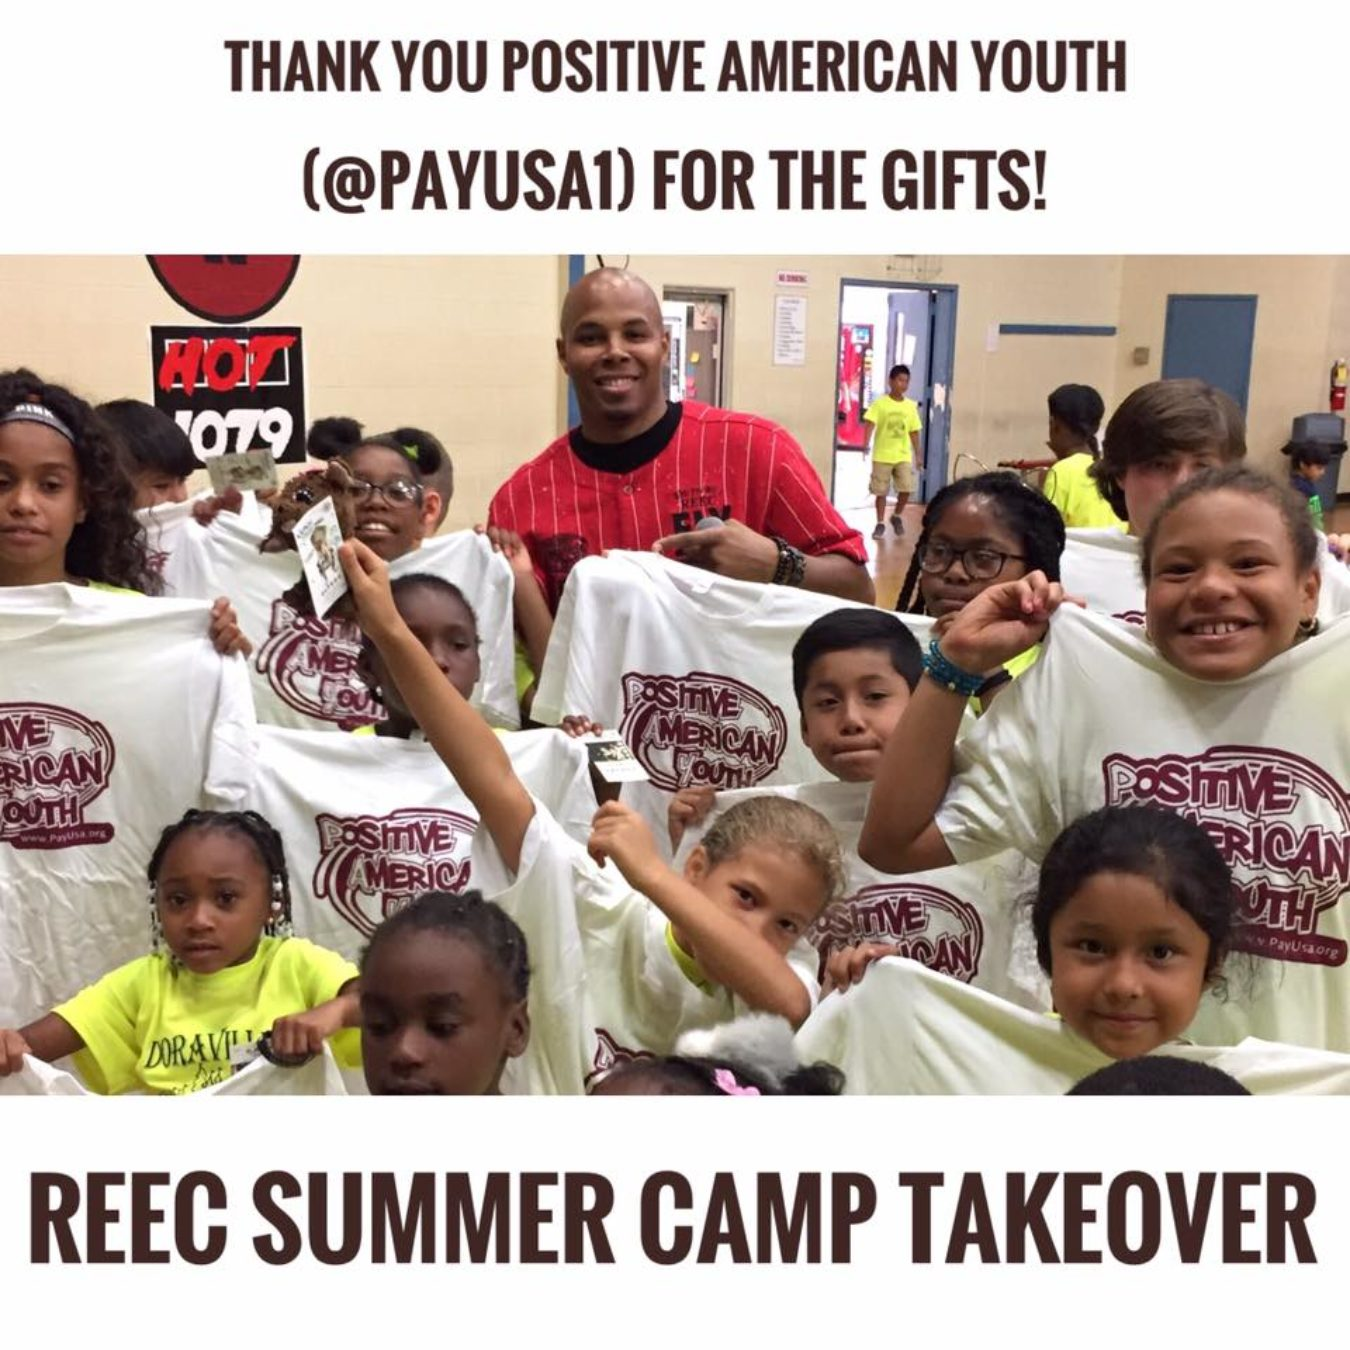 Reec Summer Camp Takeover 2 (1)